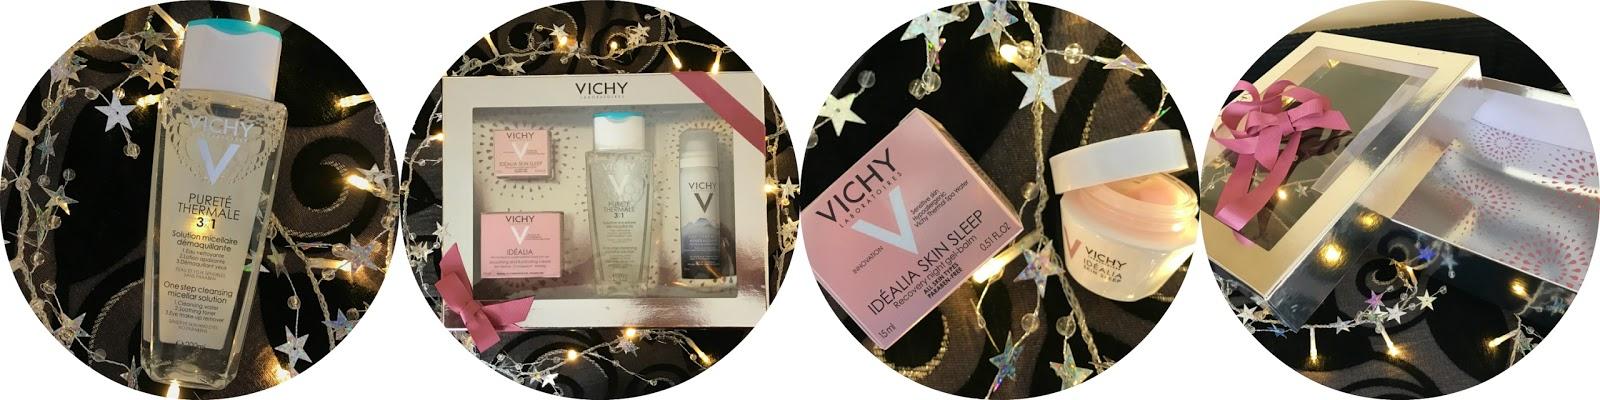 Vichy Idealia Christmas Giftset